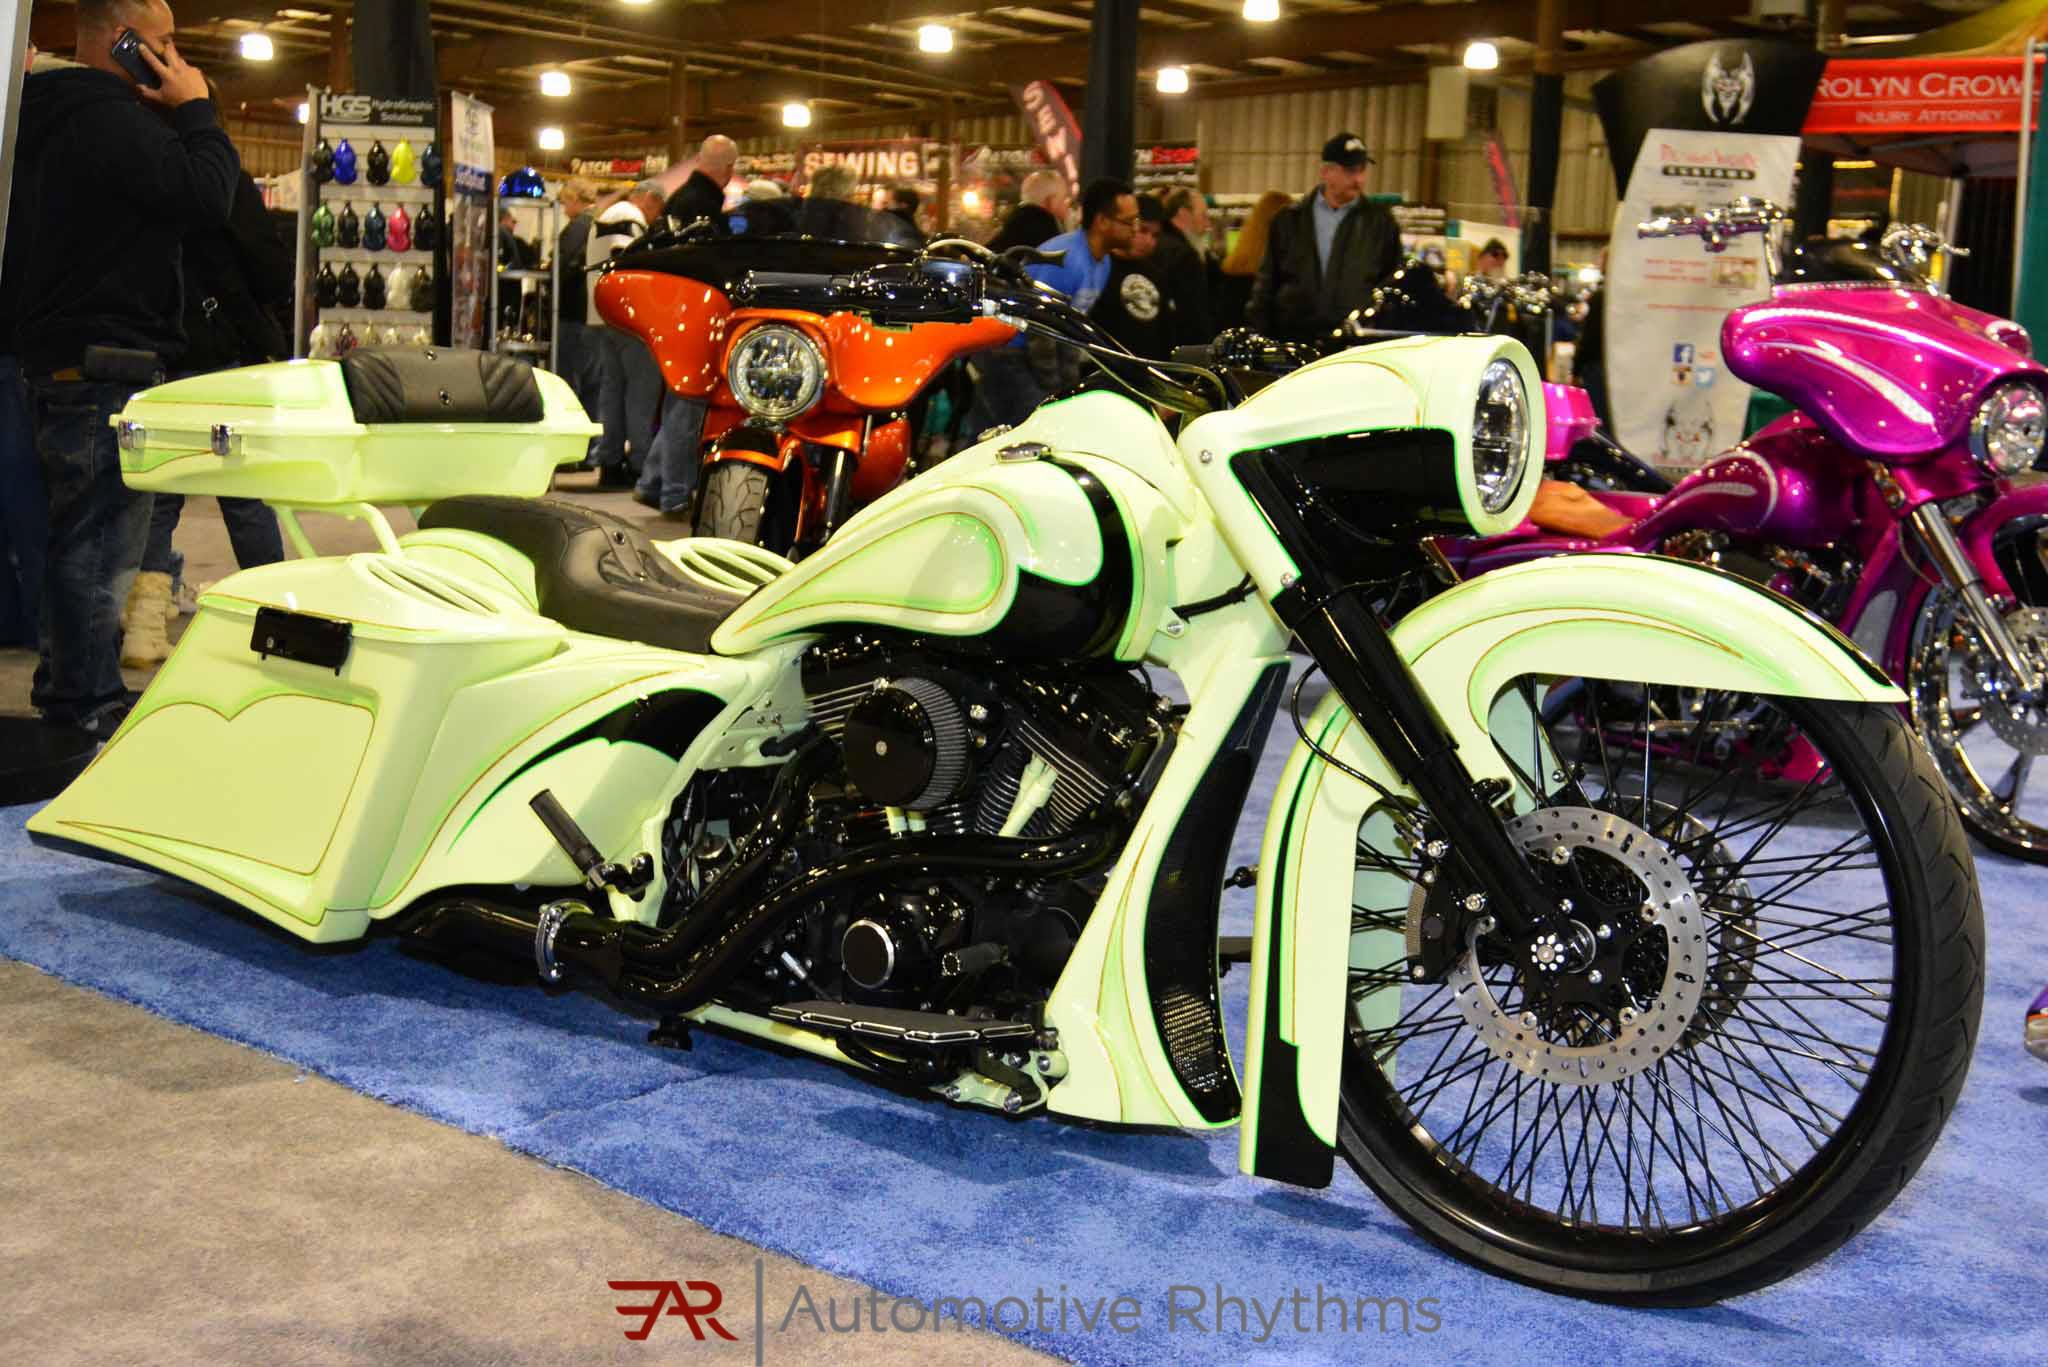 2016 Timonium Motorcycle Show AUTOMOTIVE RHYTHMS